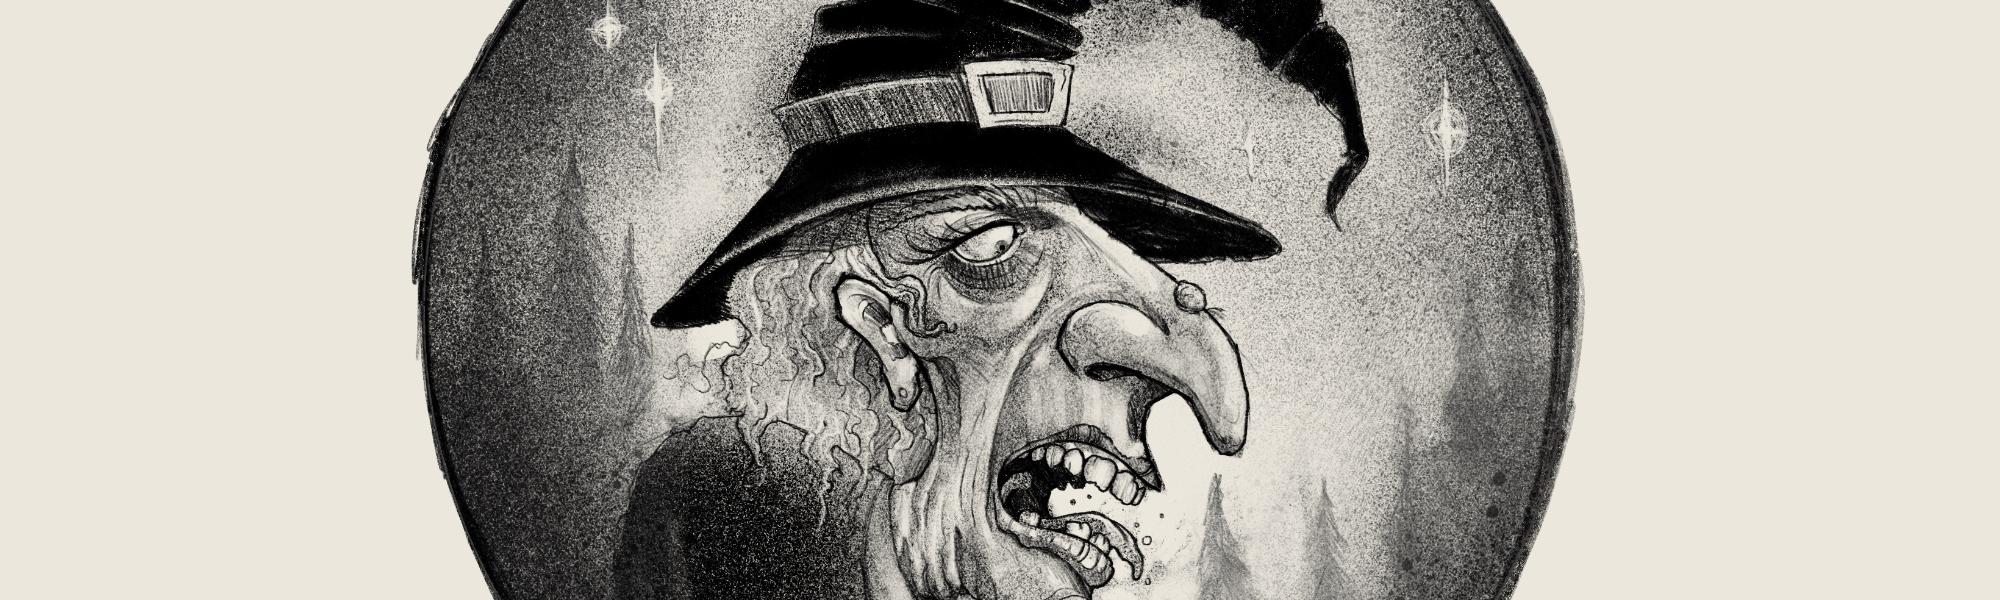 Digital Custom Illustration of a Witch